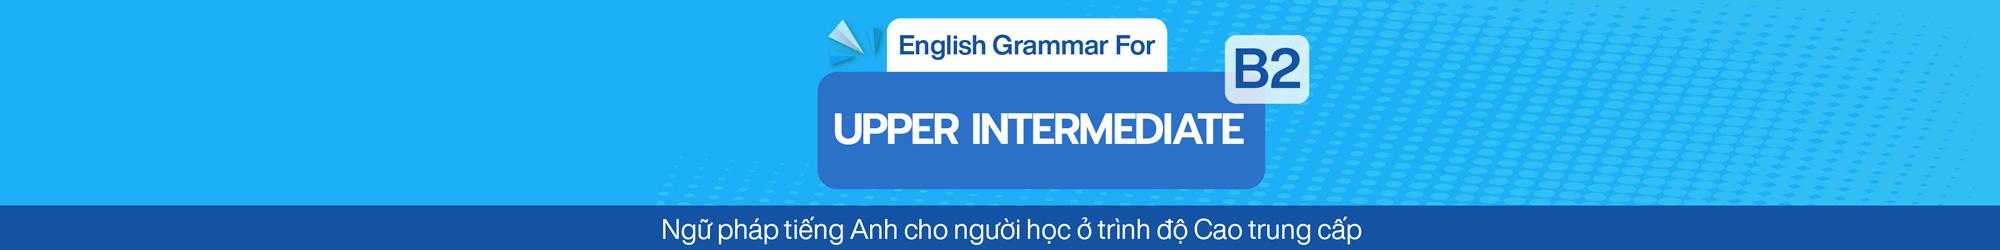 English Grammar For Upper Intermediate (B2) banner